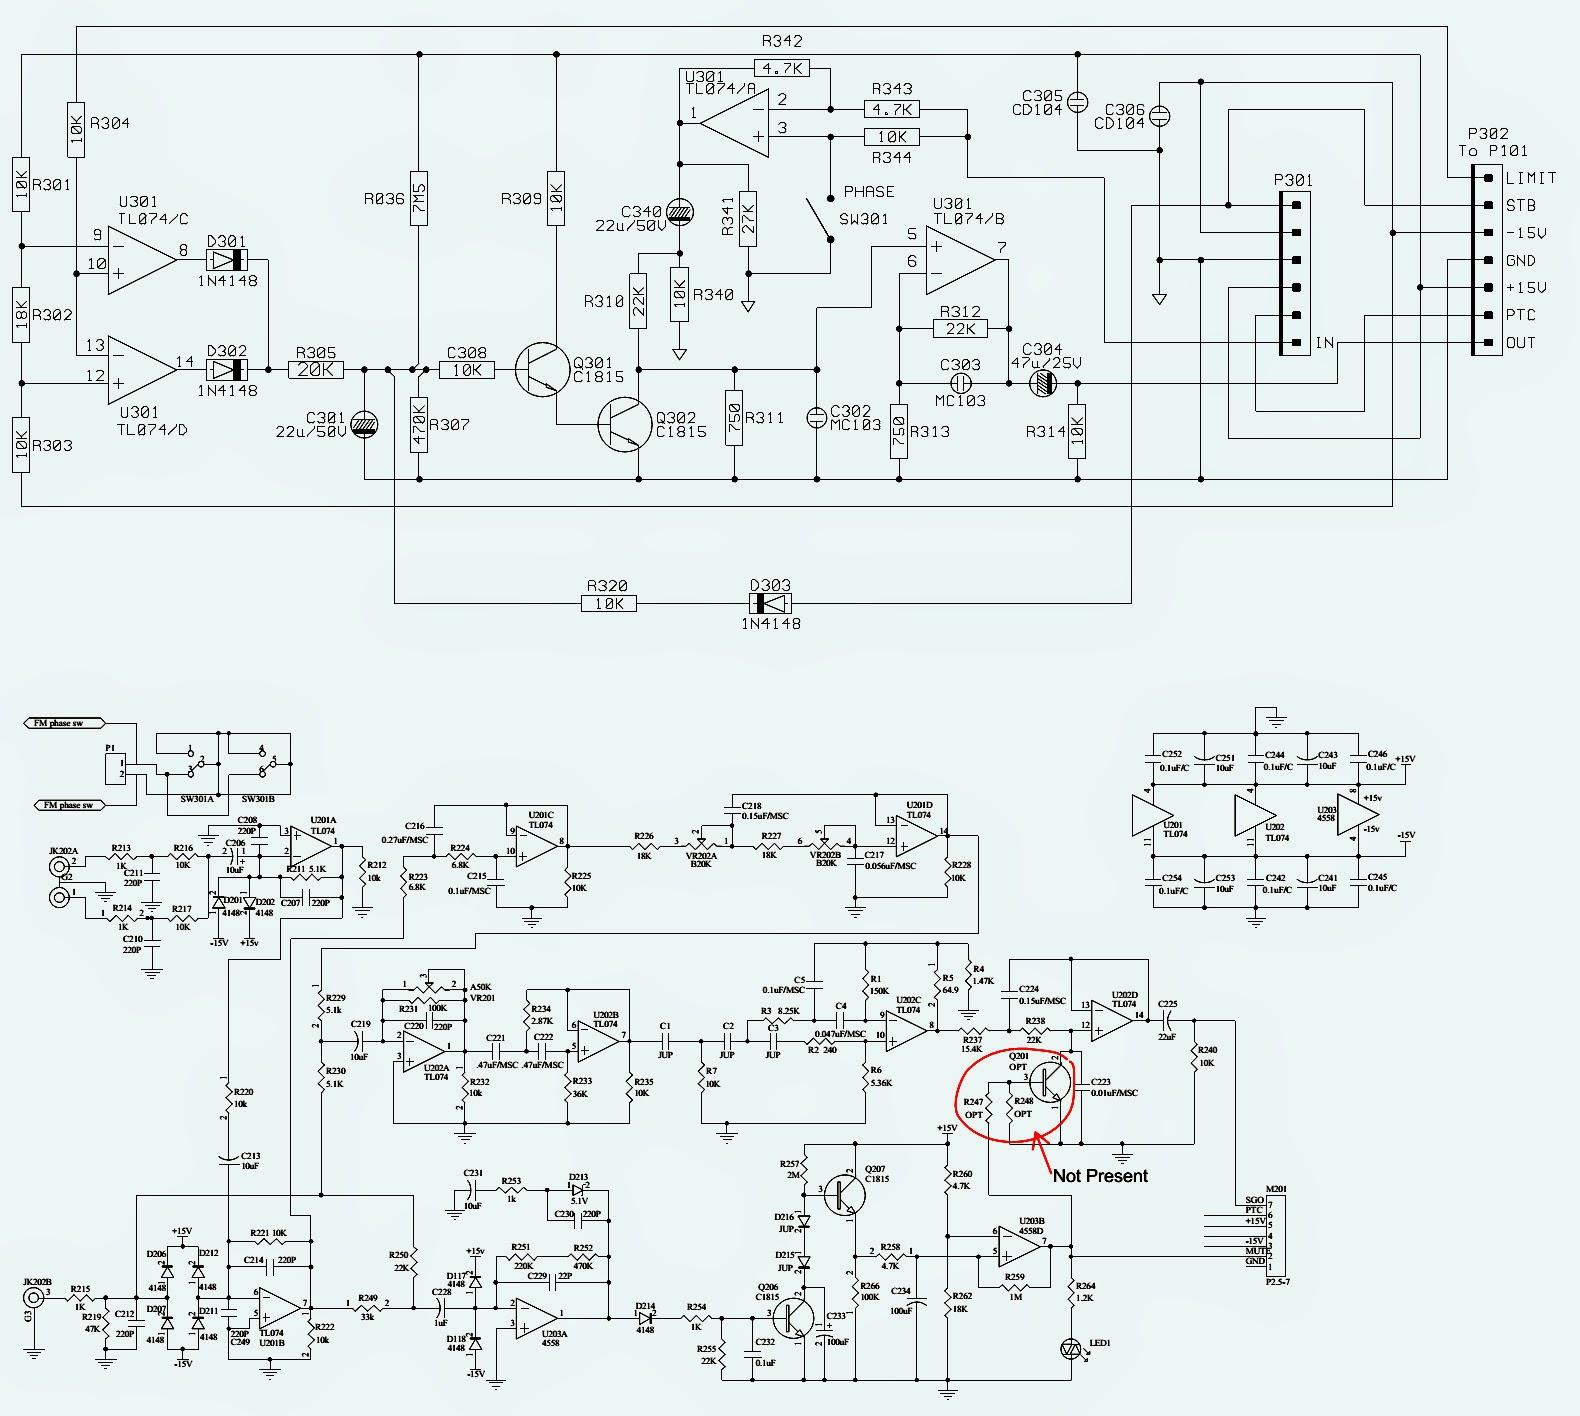 Jbl Balboa Series Powered Sub 10 Circuit Diagram Schematic Board Schematics Troubleshooting